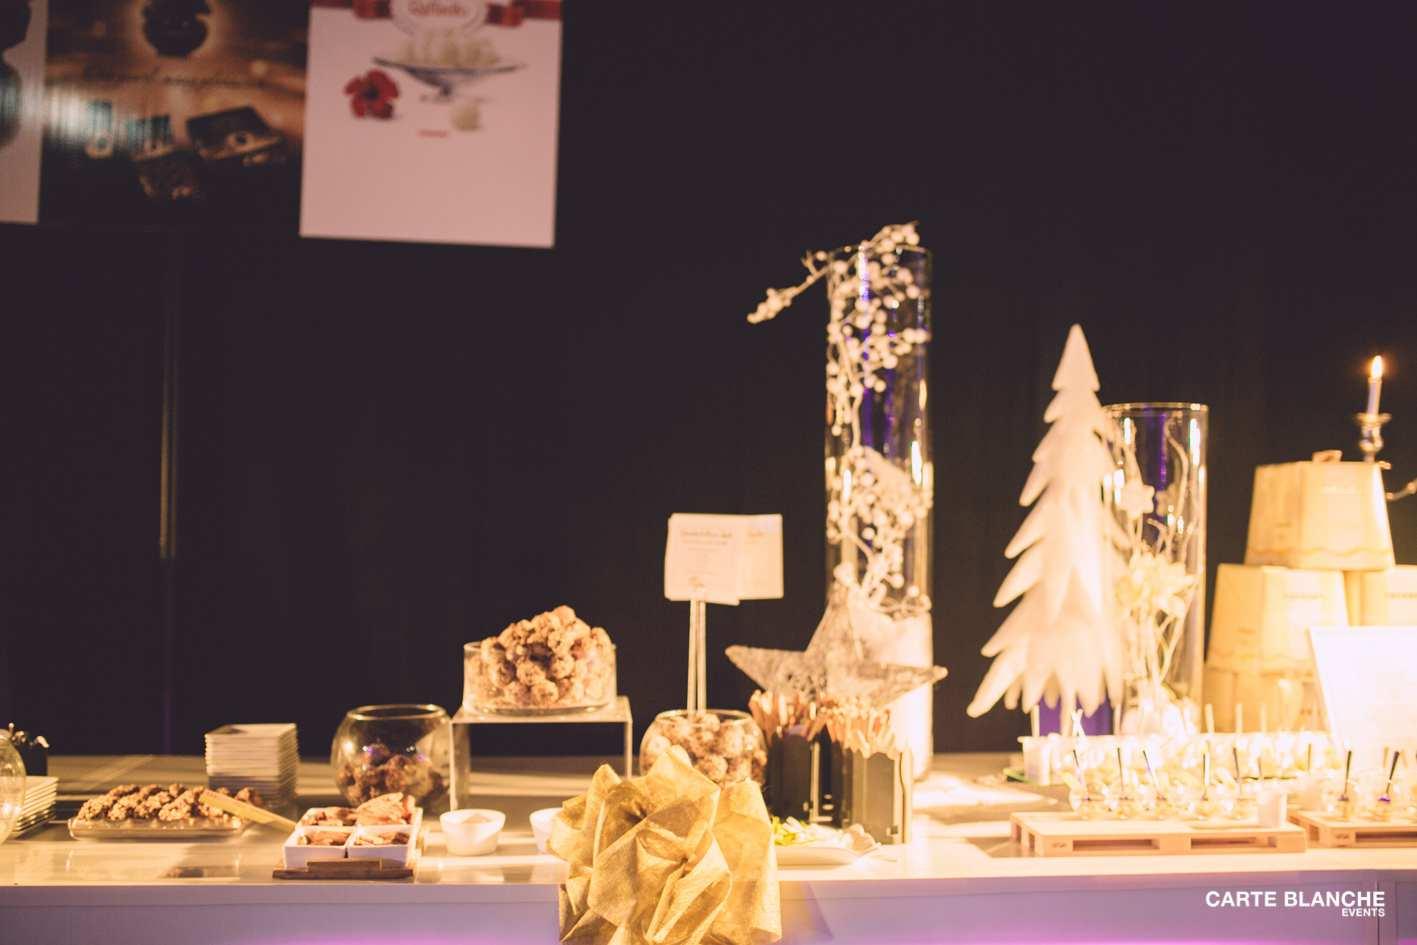 xmas-party-ferrero-2013-buffet-repas-projet-luxembourg